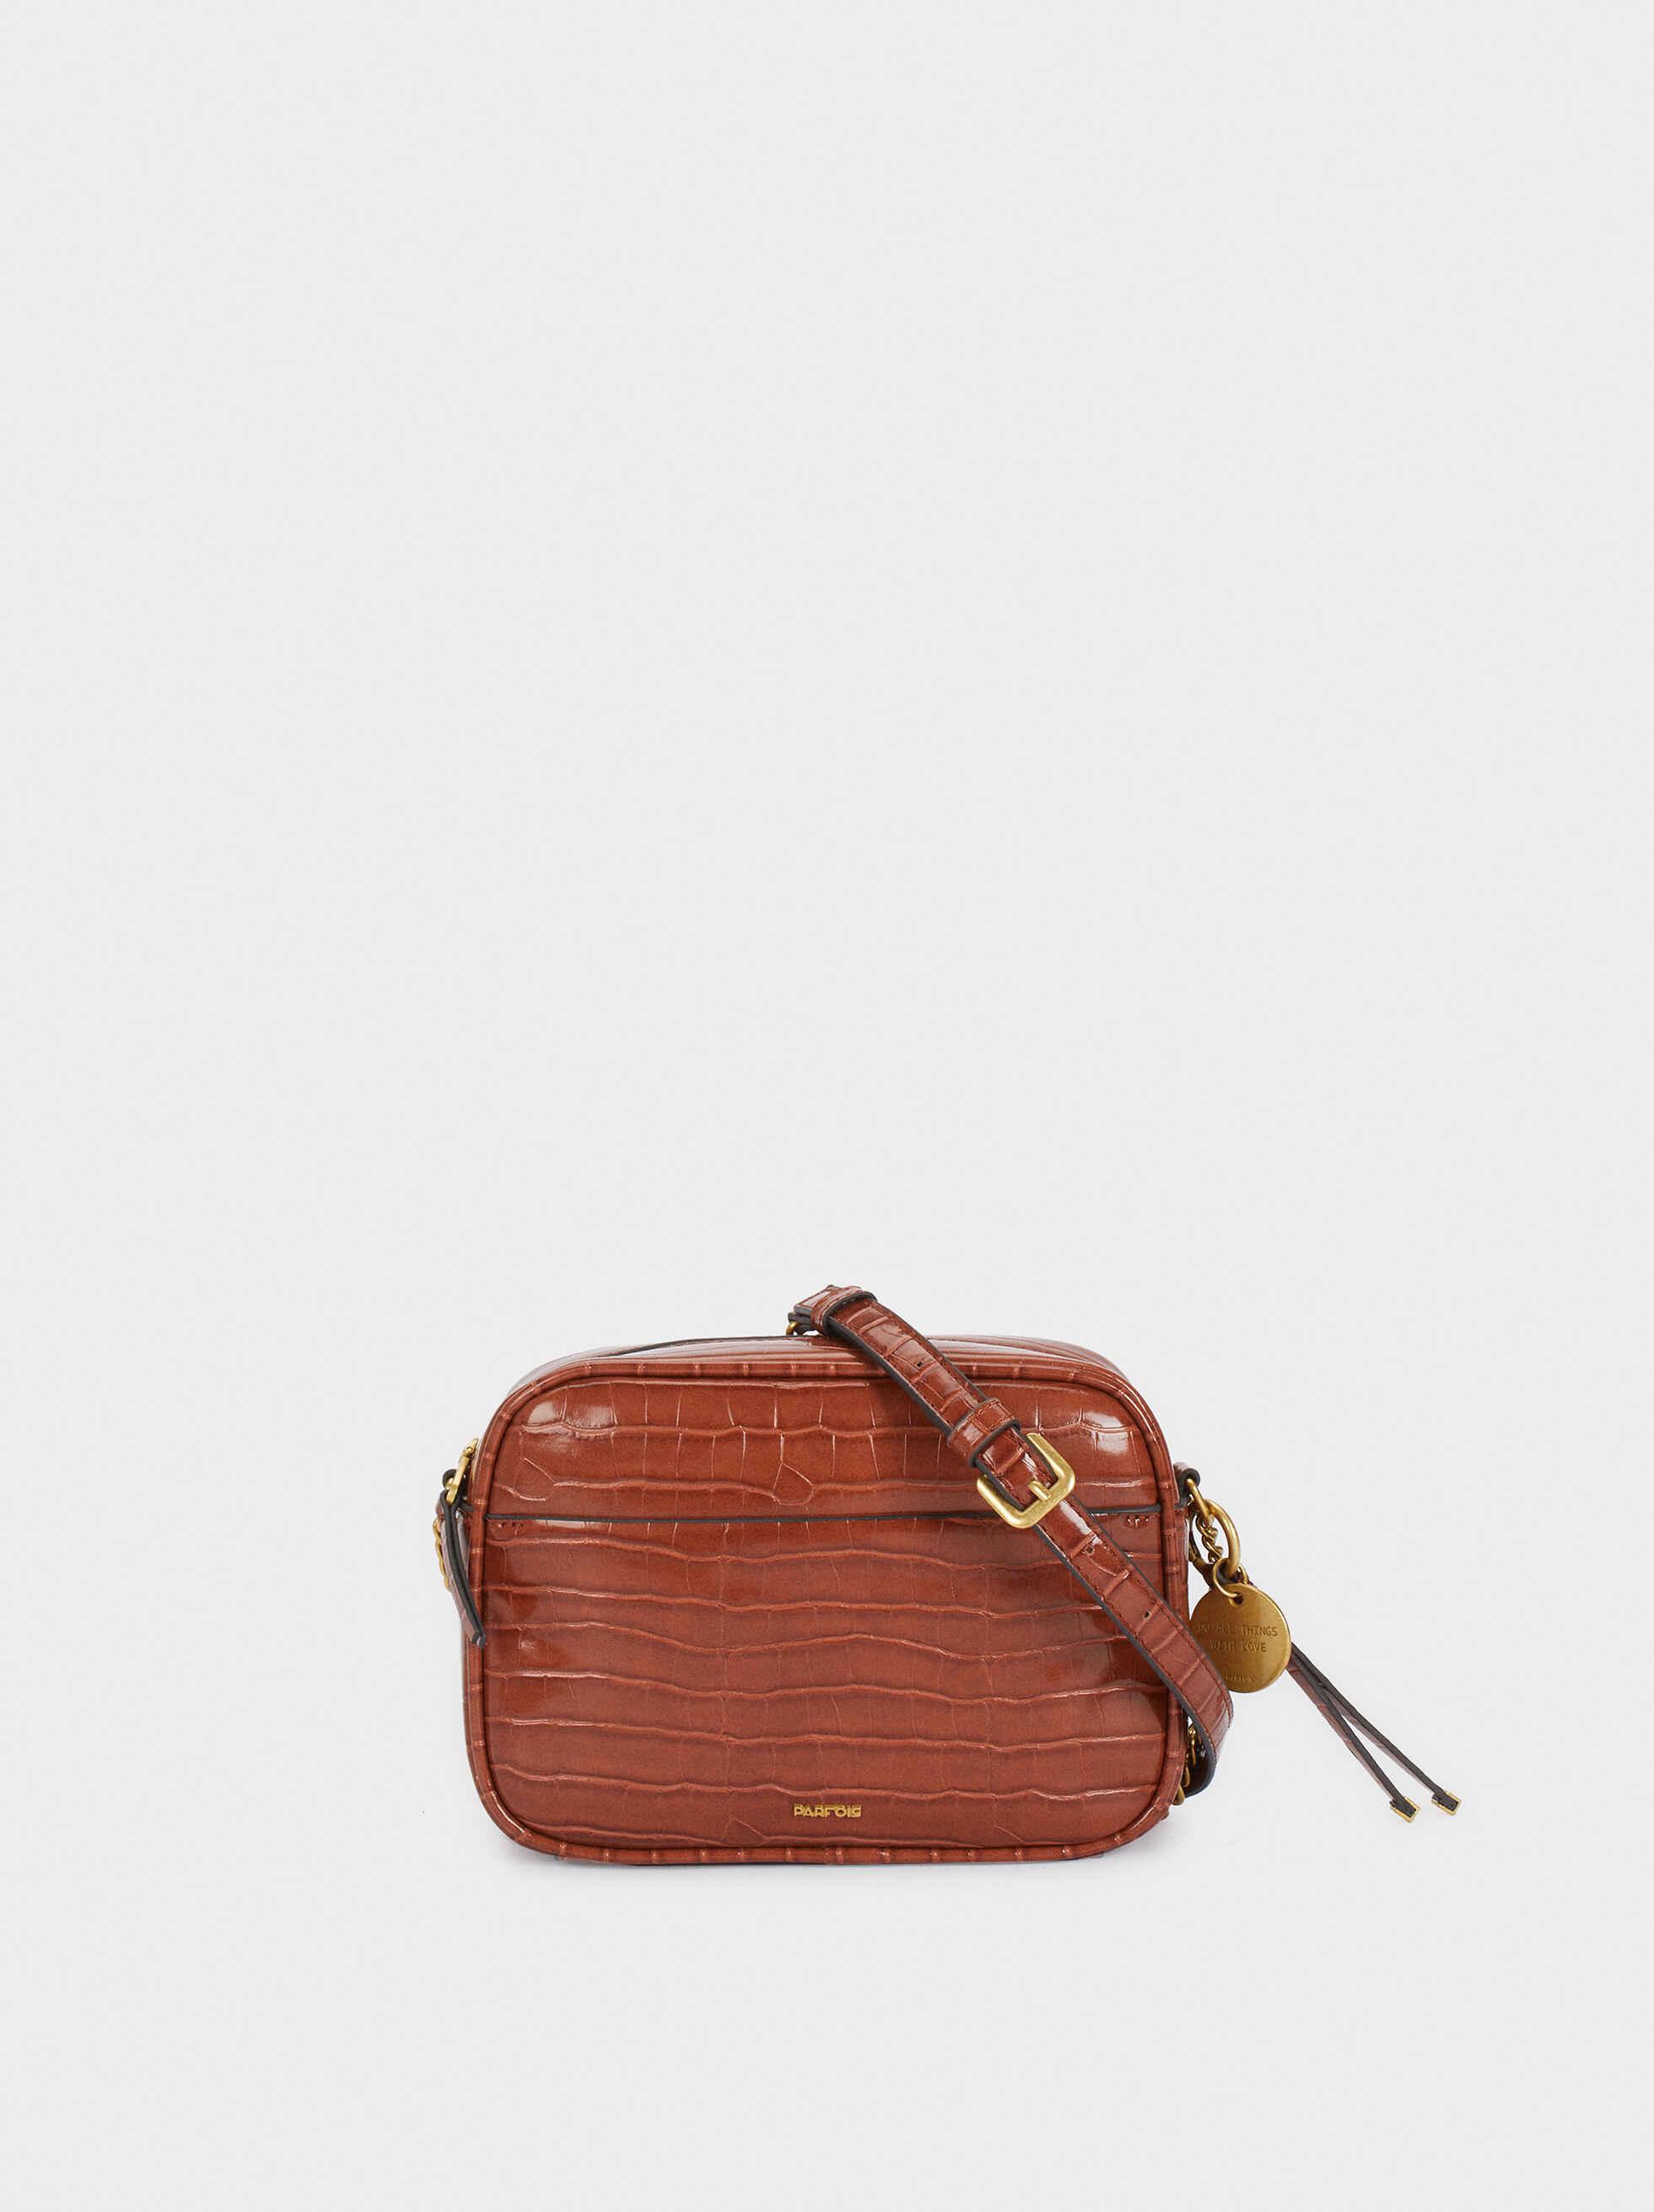 Embossed Animal Print Crossbody Bag With Adjustable Strap, Camel, hi-res